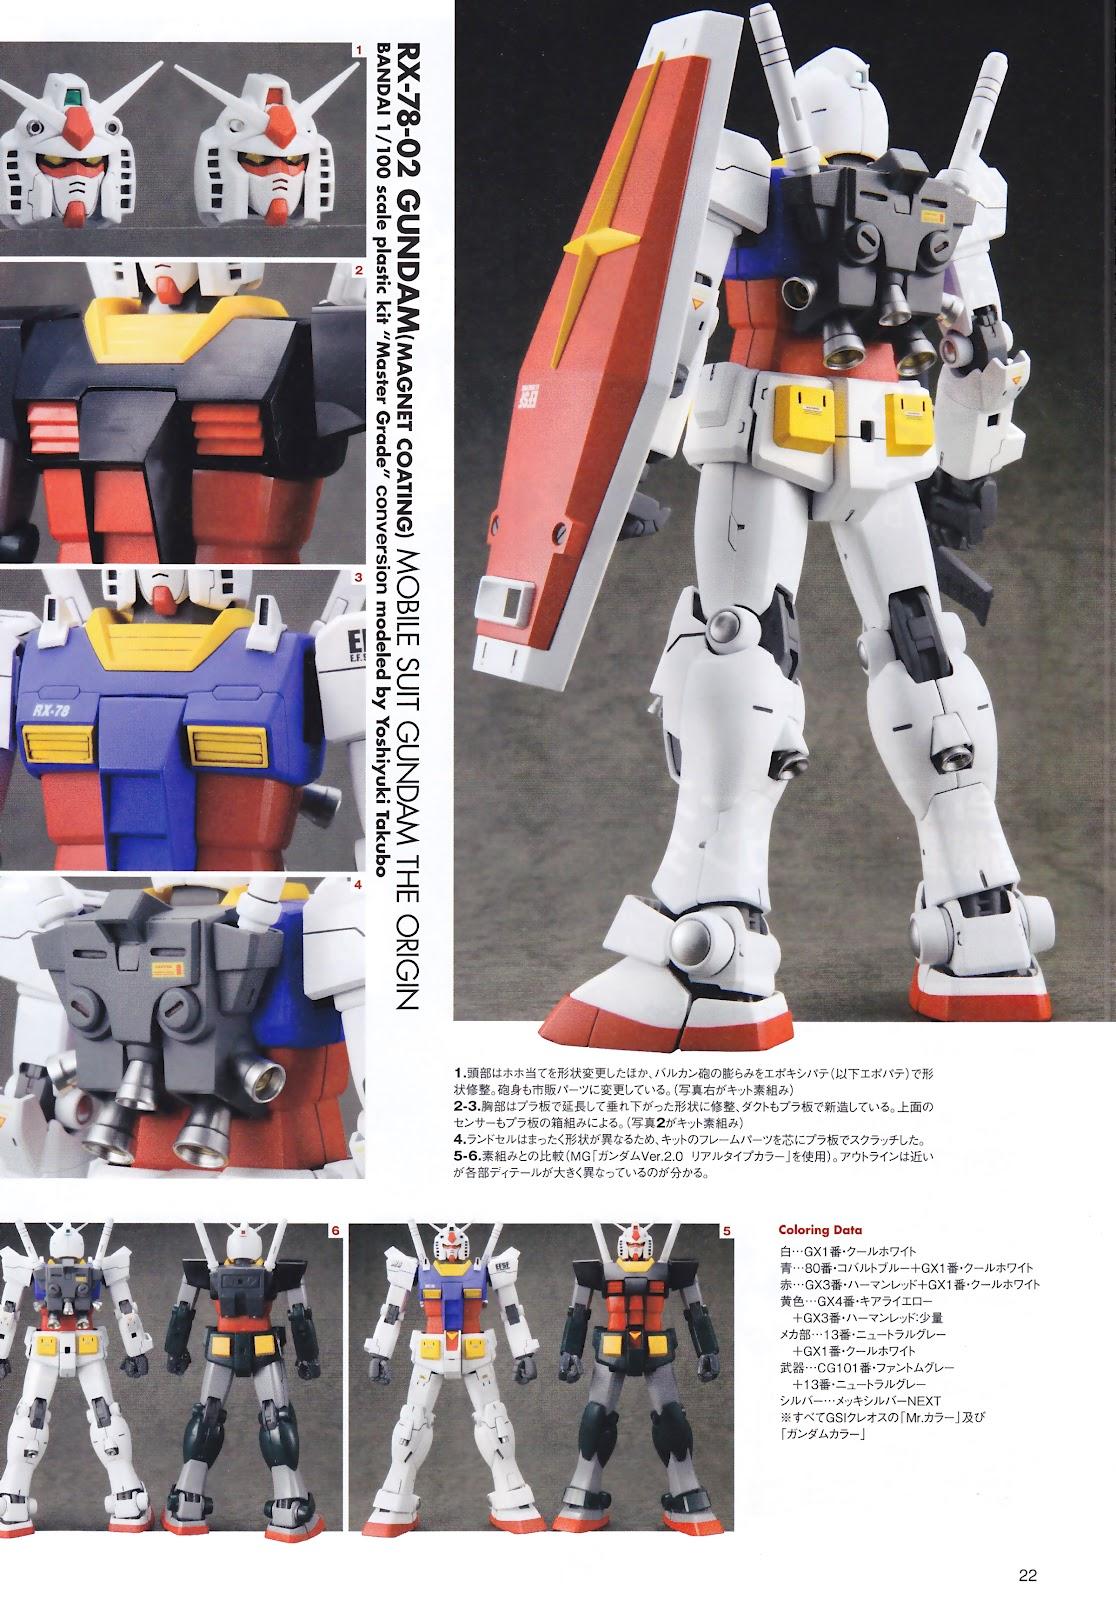 RX-78 T MG RX-78-02 Gundam Conversion Kit 3